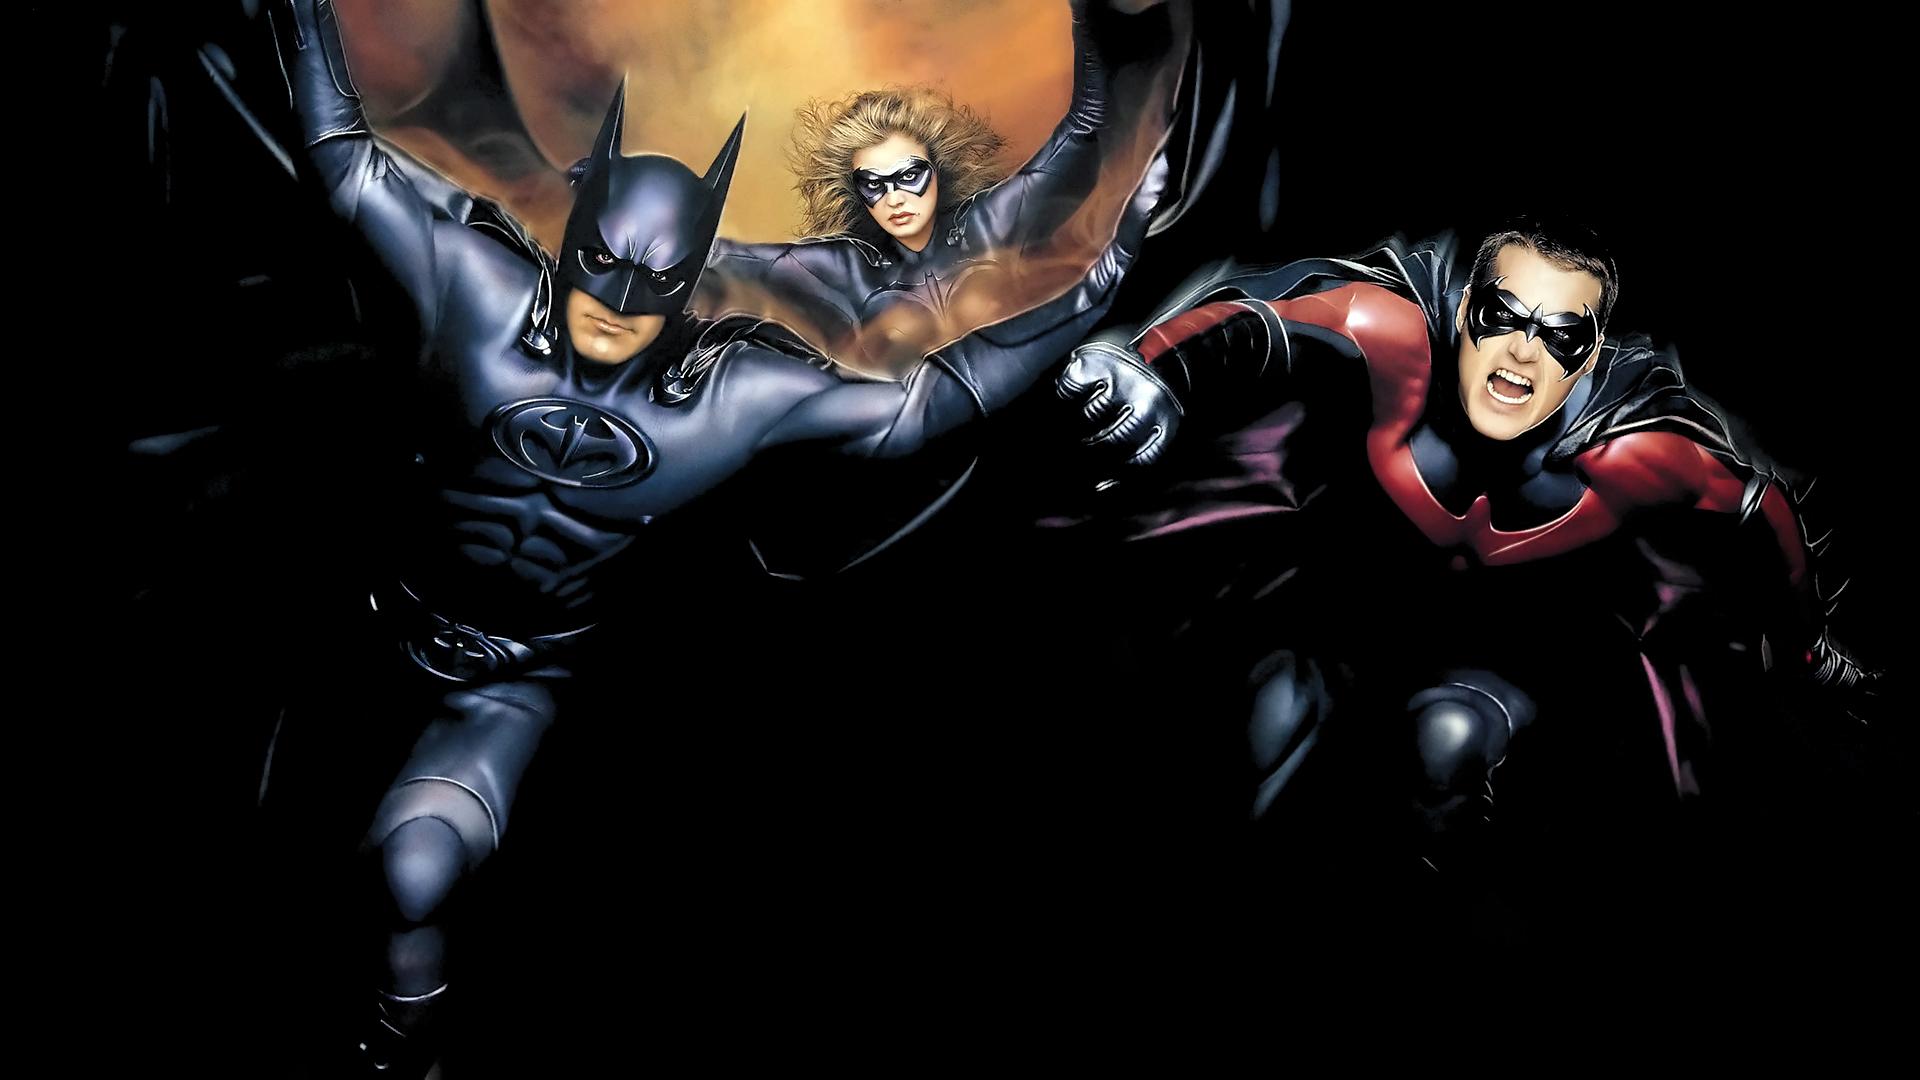 Please login to upload imagesRobin Superhero Movie